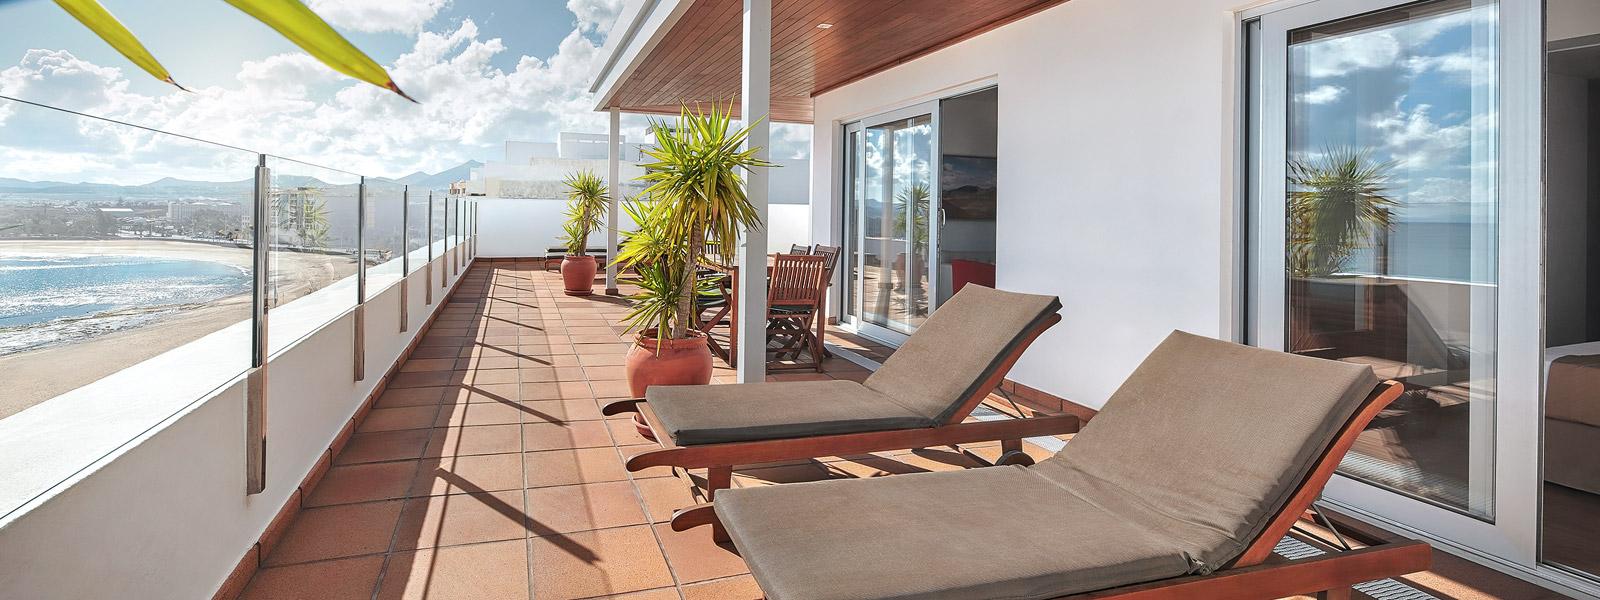 hotel-lancelot-suites-terraza